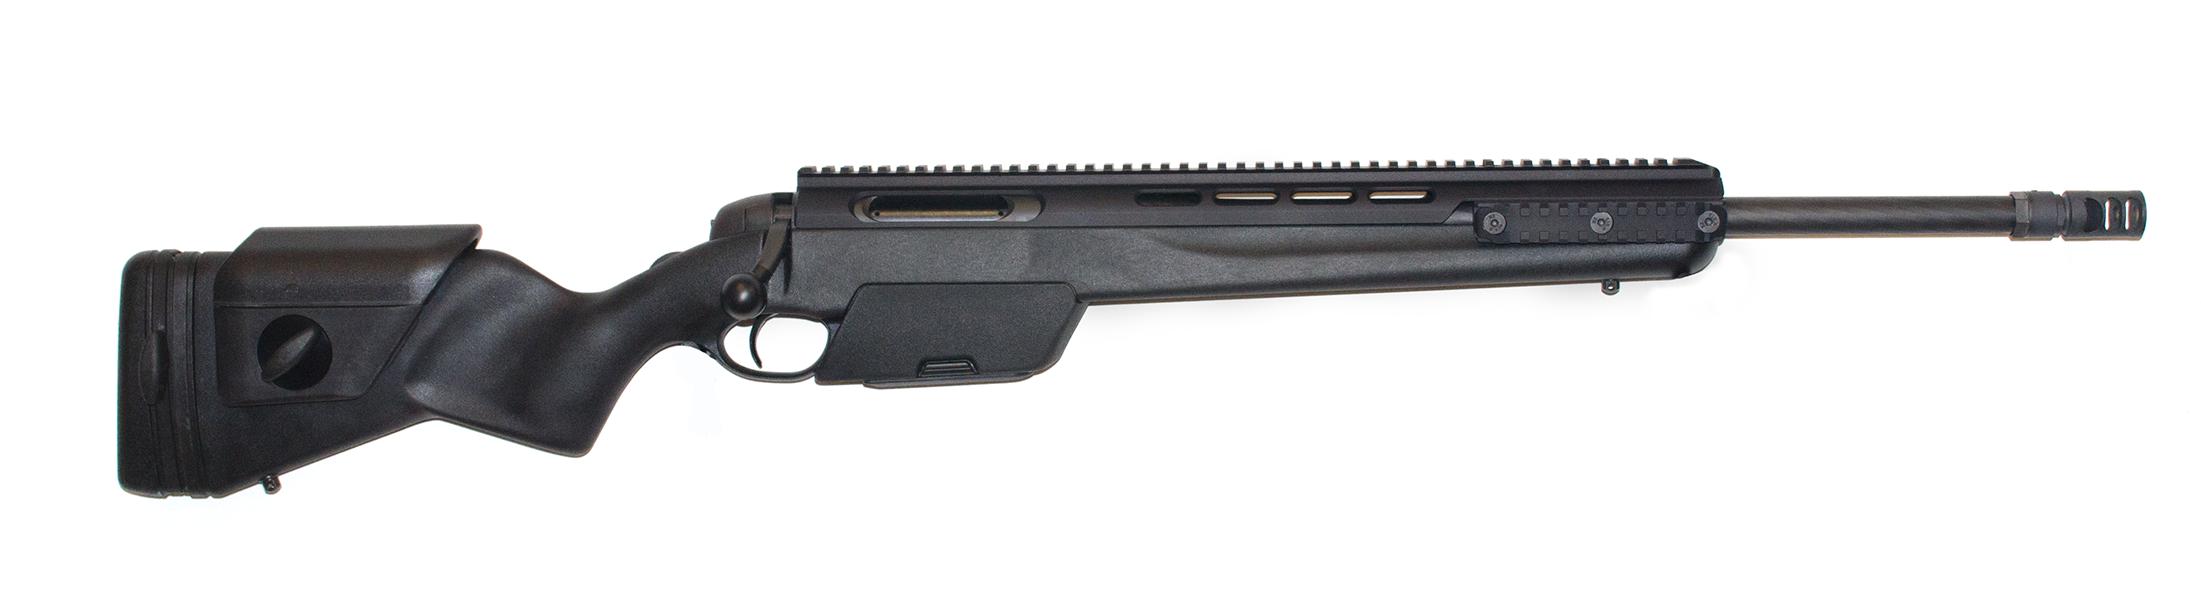 Steyr SSG04 A1 308Win Black Coloured Stock 10rnd Mag